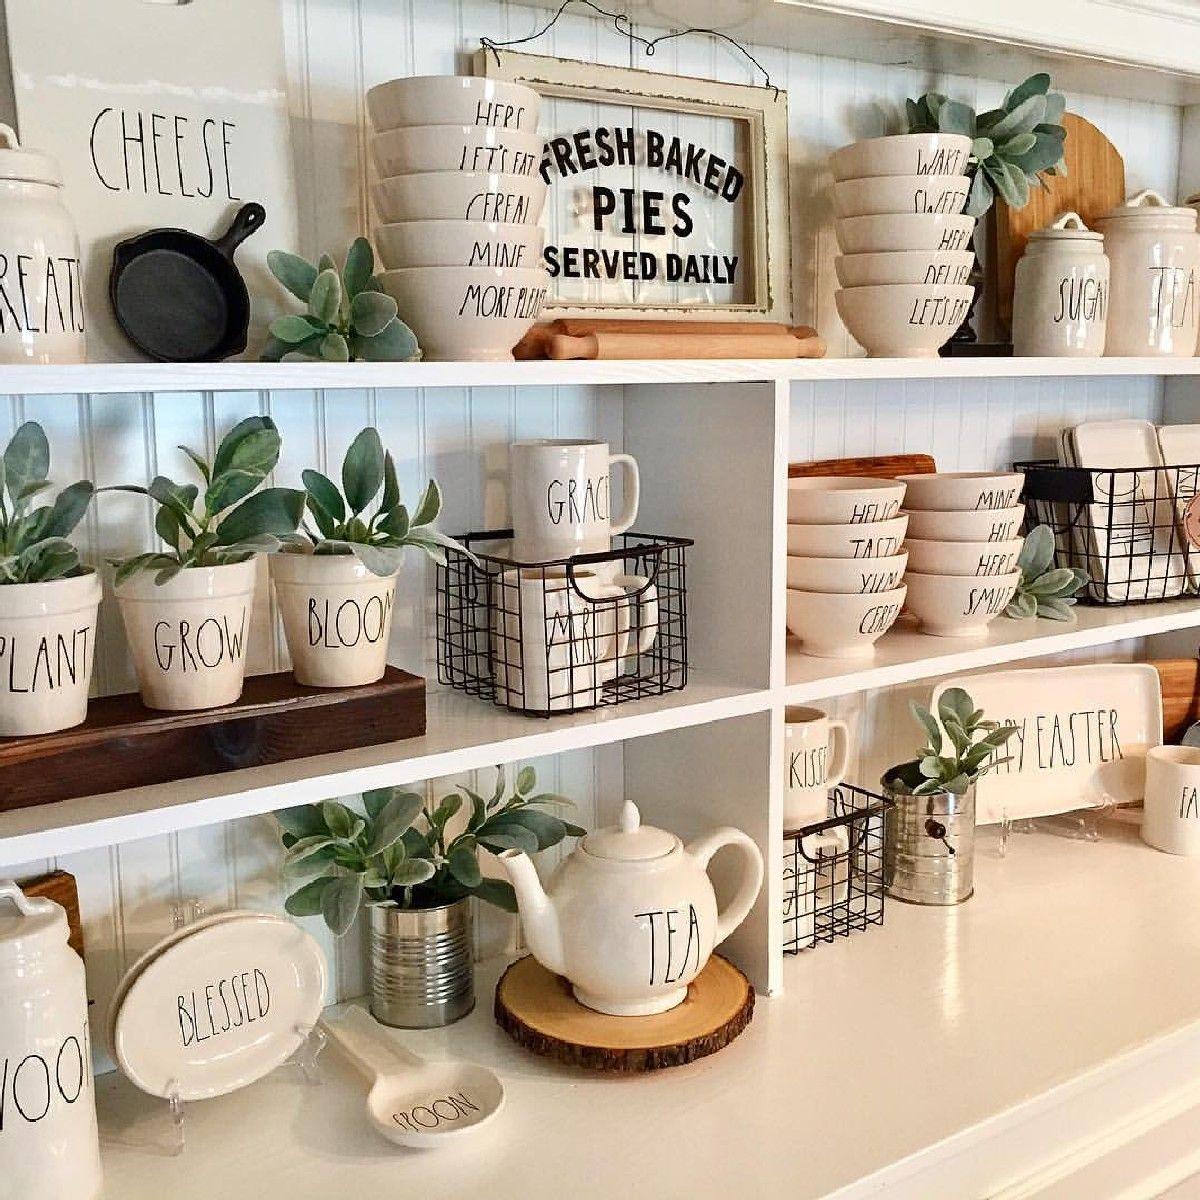 Amazing Diy Rae Dunn Display Ideas And Pictures 53 Read More Farmhouse Kitchen Decor Kitchen Decor Decor